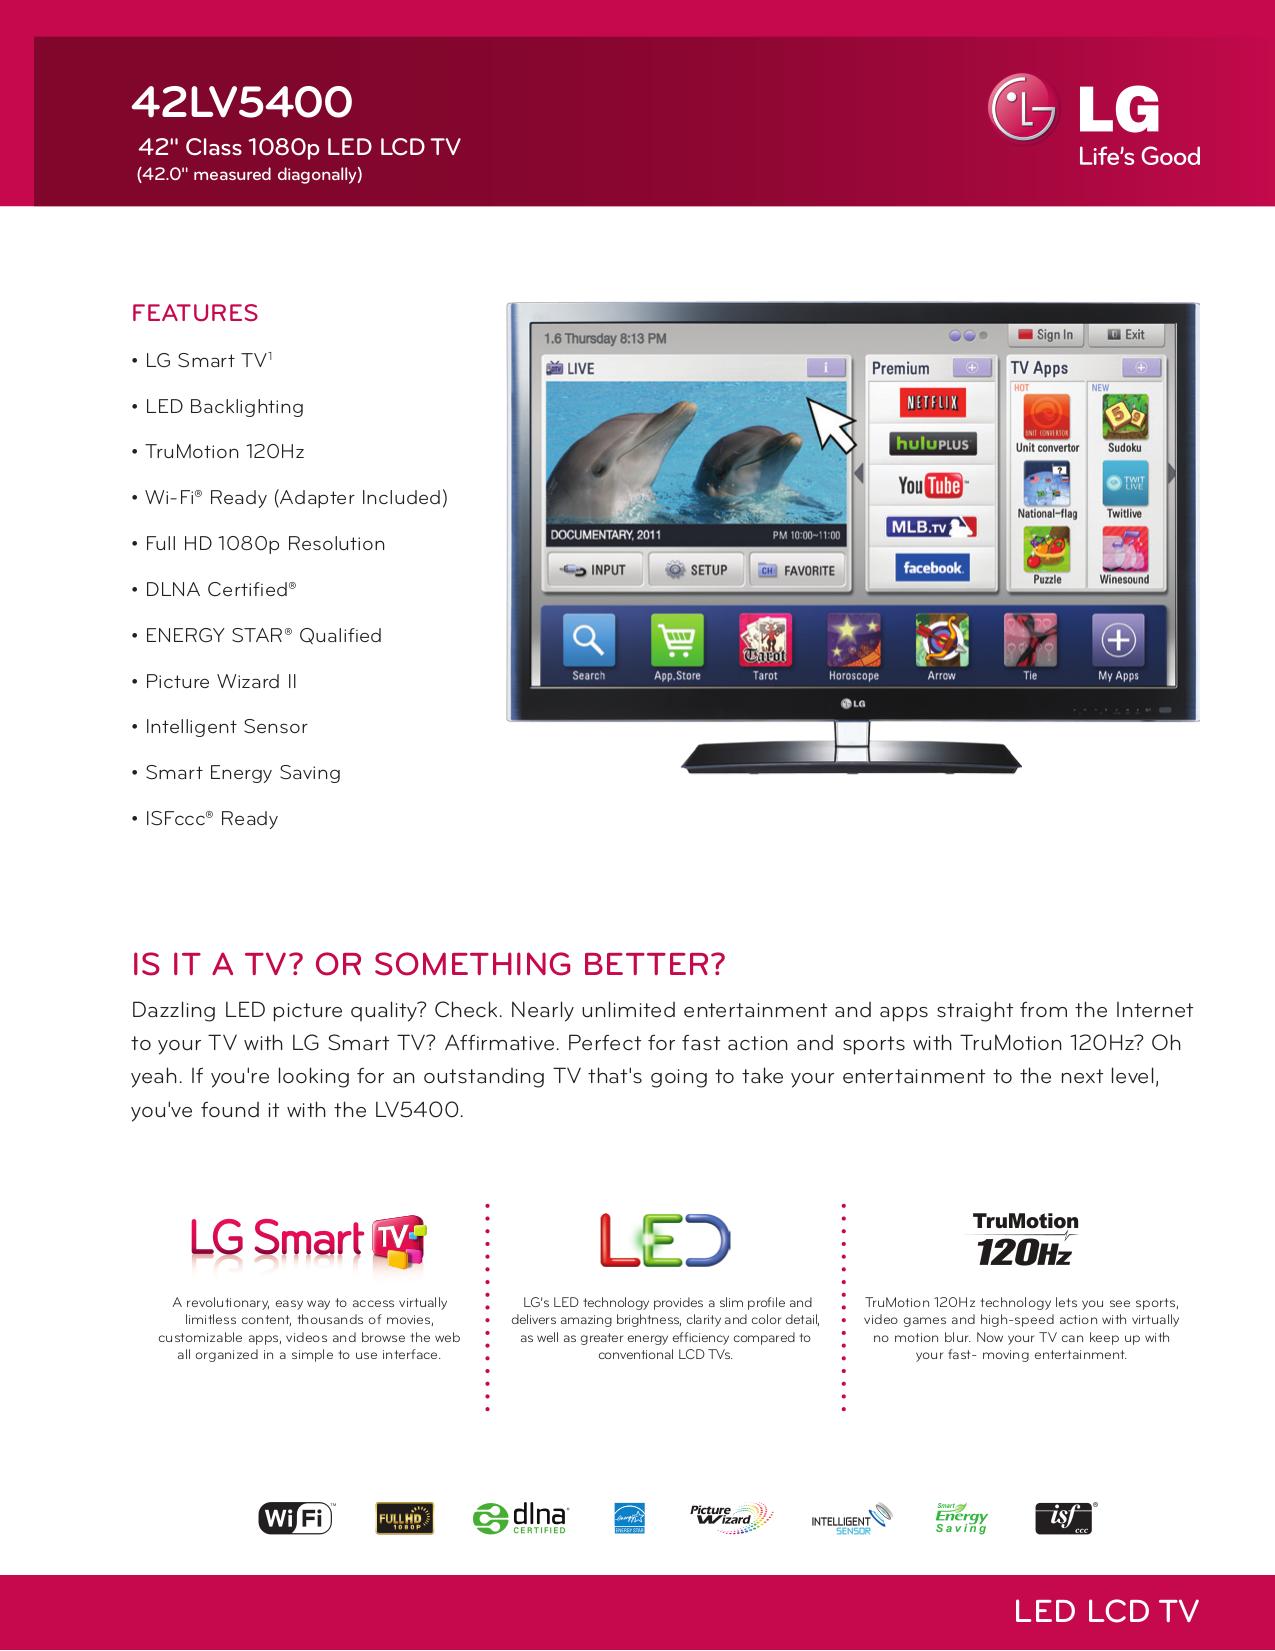 Download free pdf for LG 42LV5400 TV manual